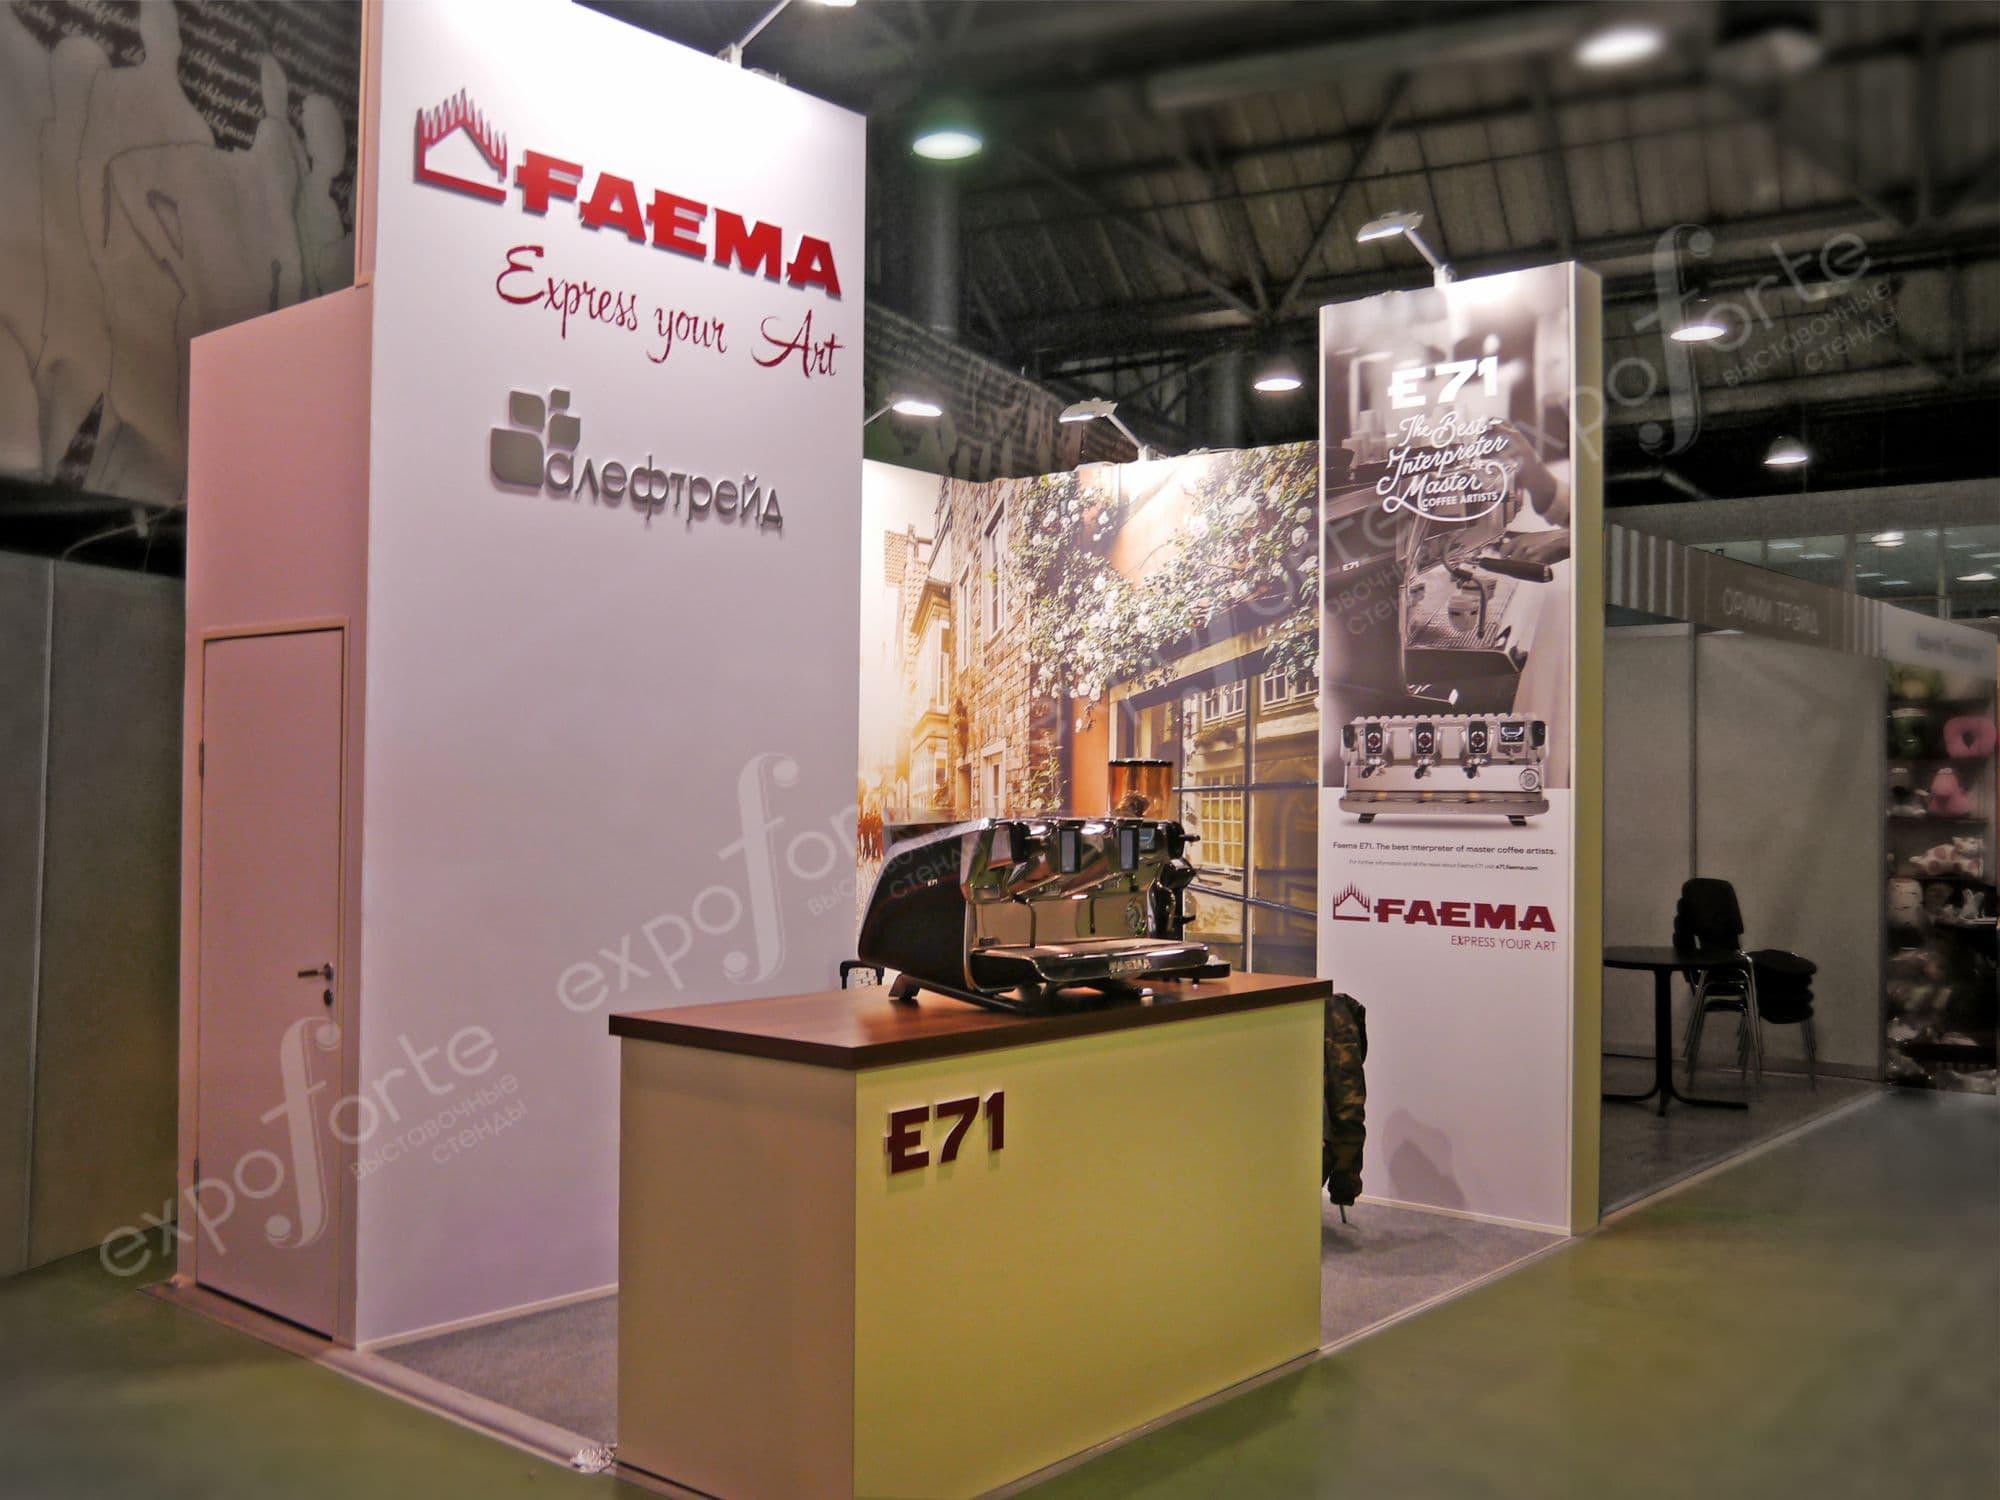 Фото: FAEMA, выставка RUSSIAN COFFEE TEA INDUSTRY EVENT – картинка 1